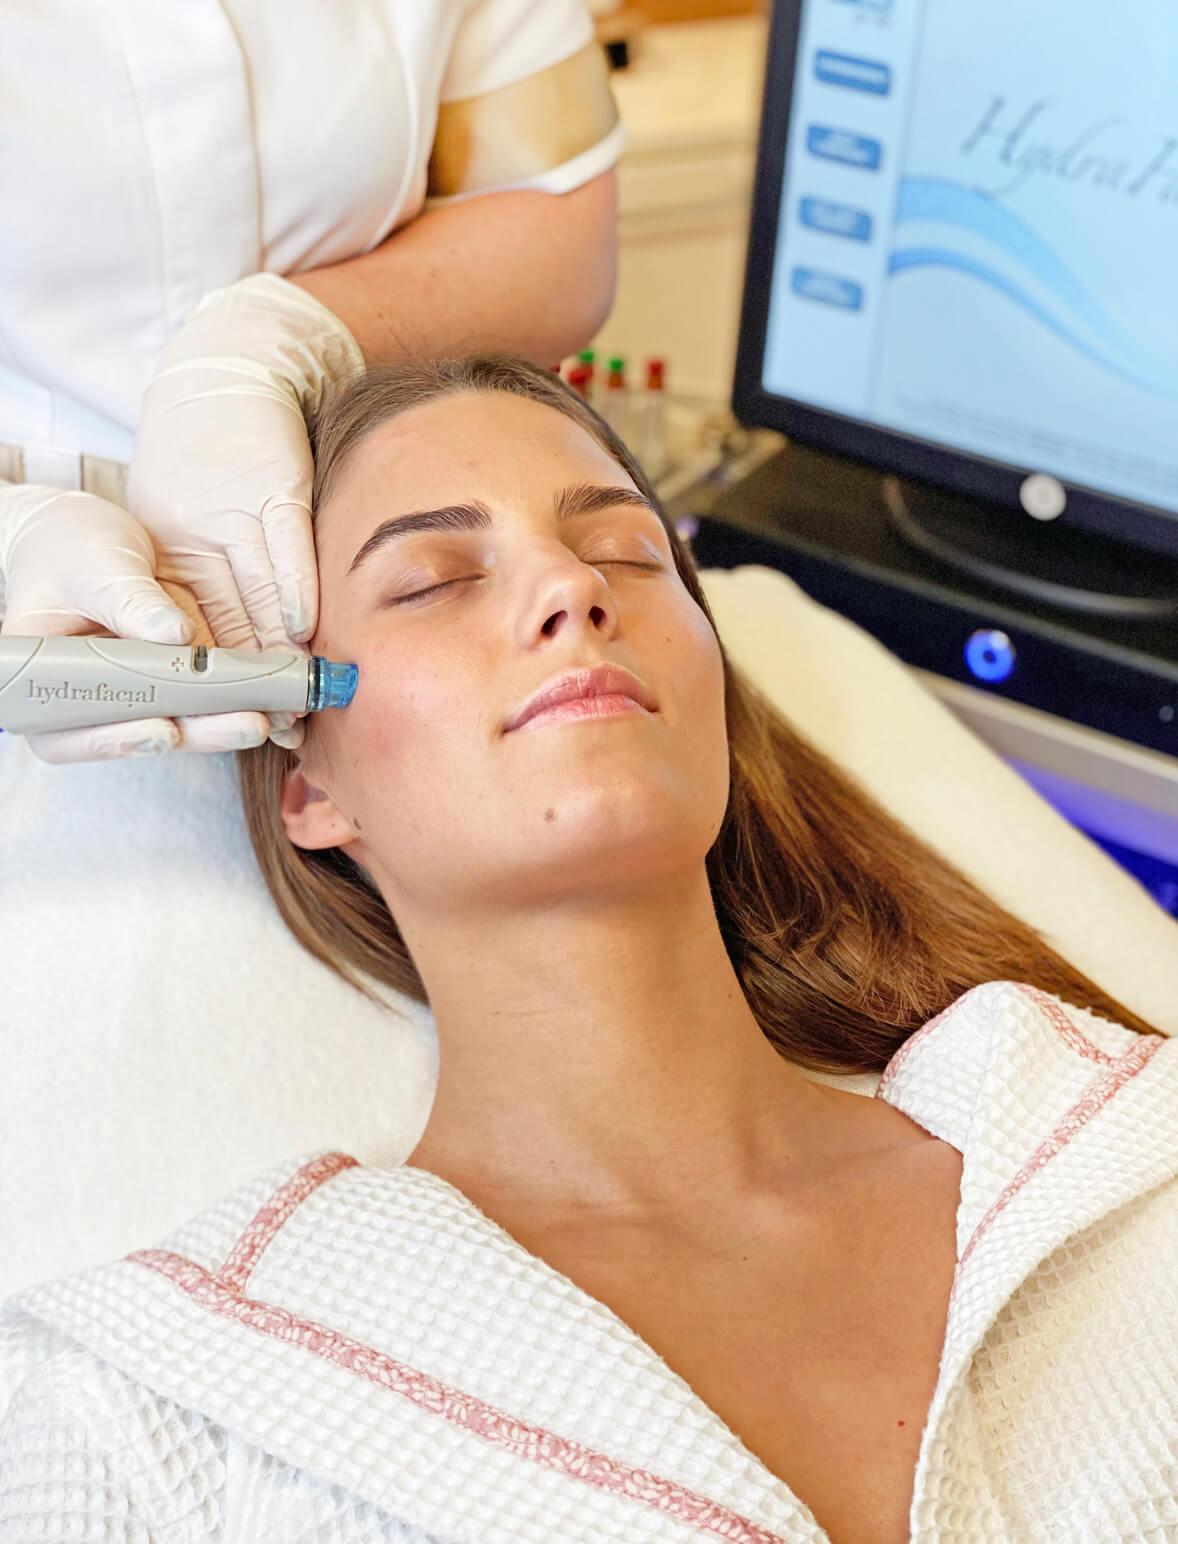 HydraFacial veido procedūra